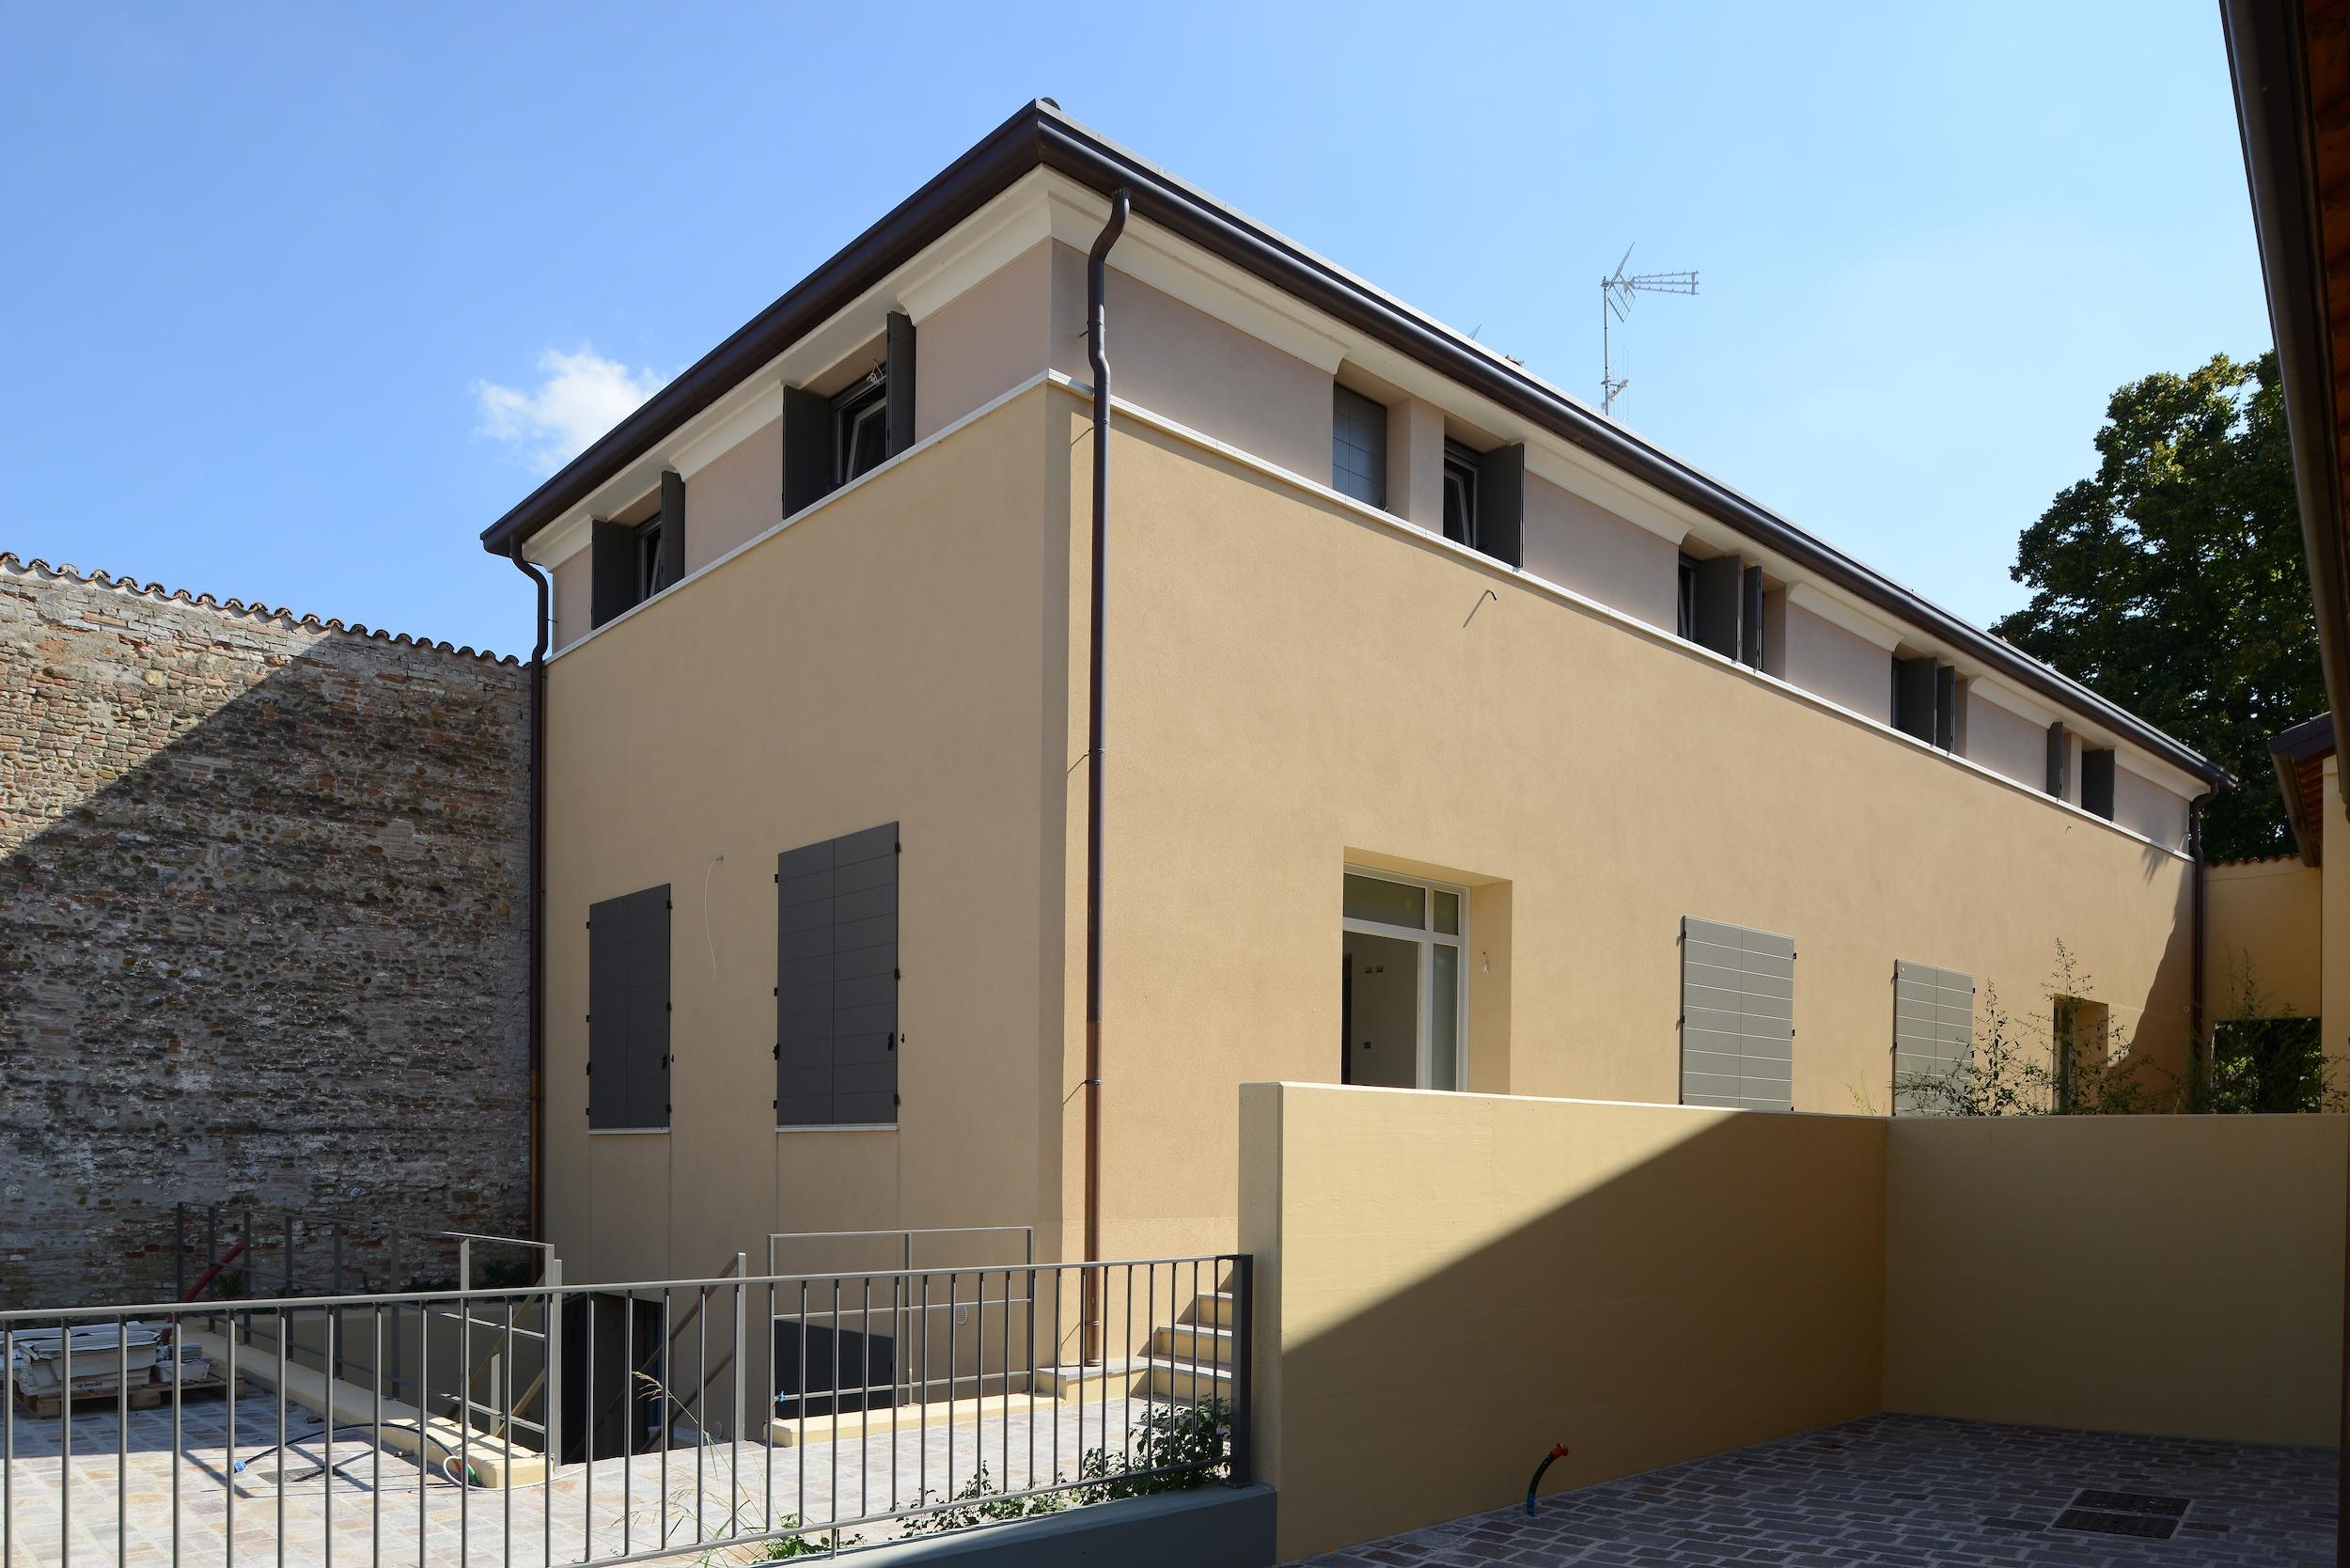 6312 Studio Bacchi Architetti Santa Chiara Residenziale